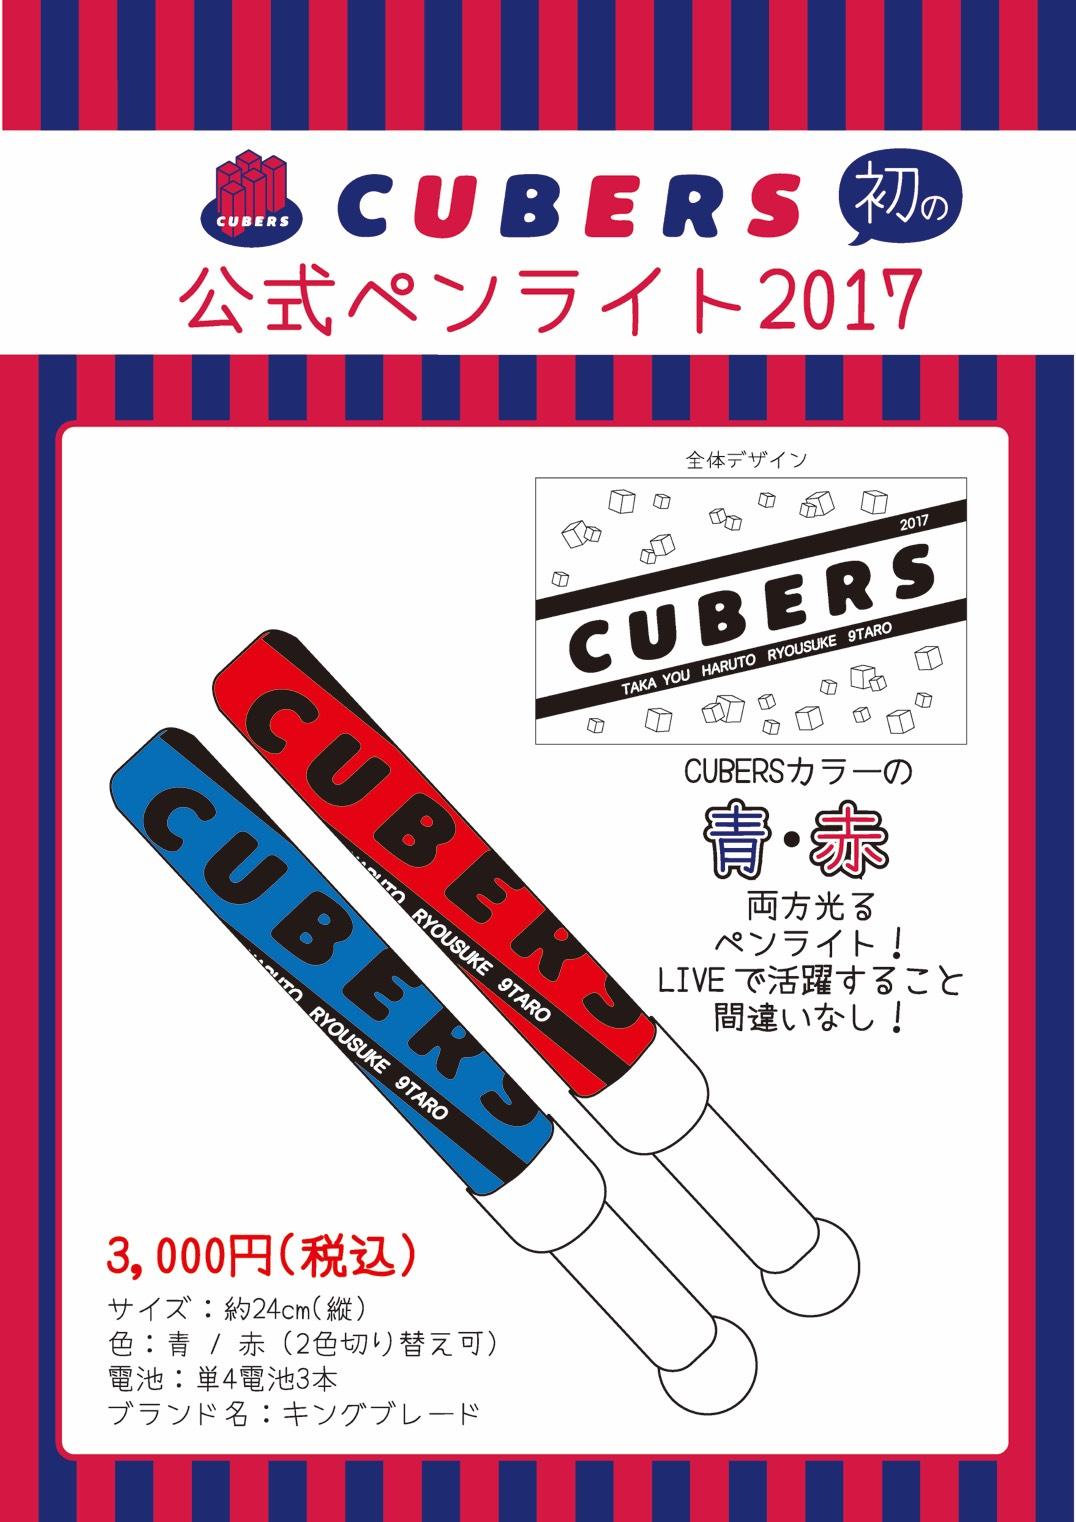 【NEWS】CUBERS、初の公式ペンライト2017発売のお知らせ!